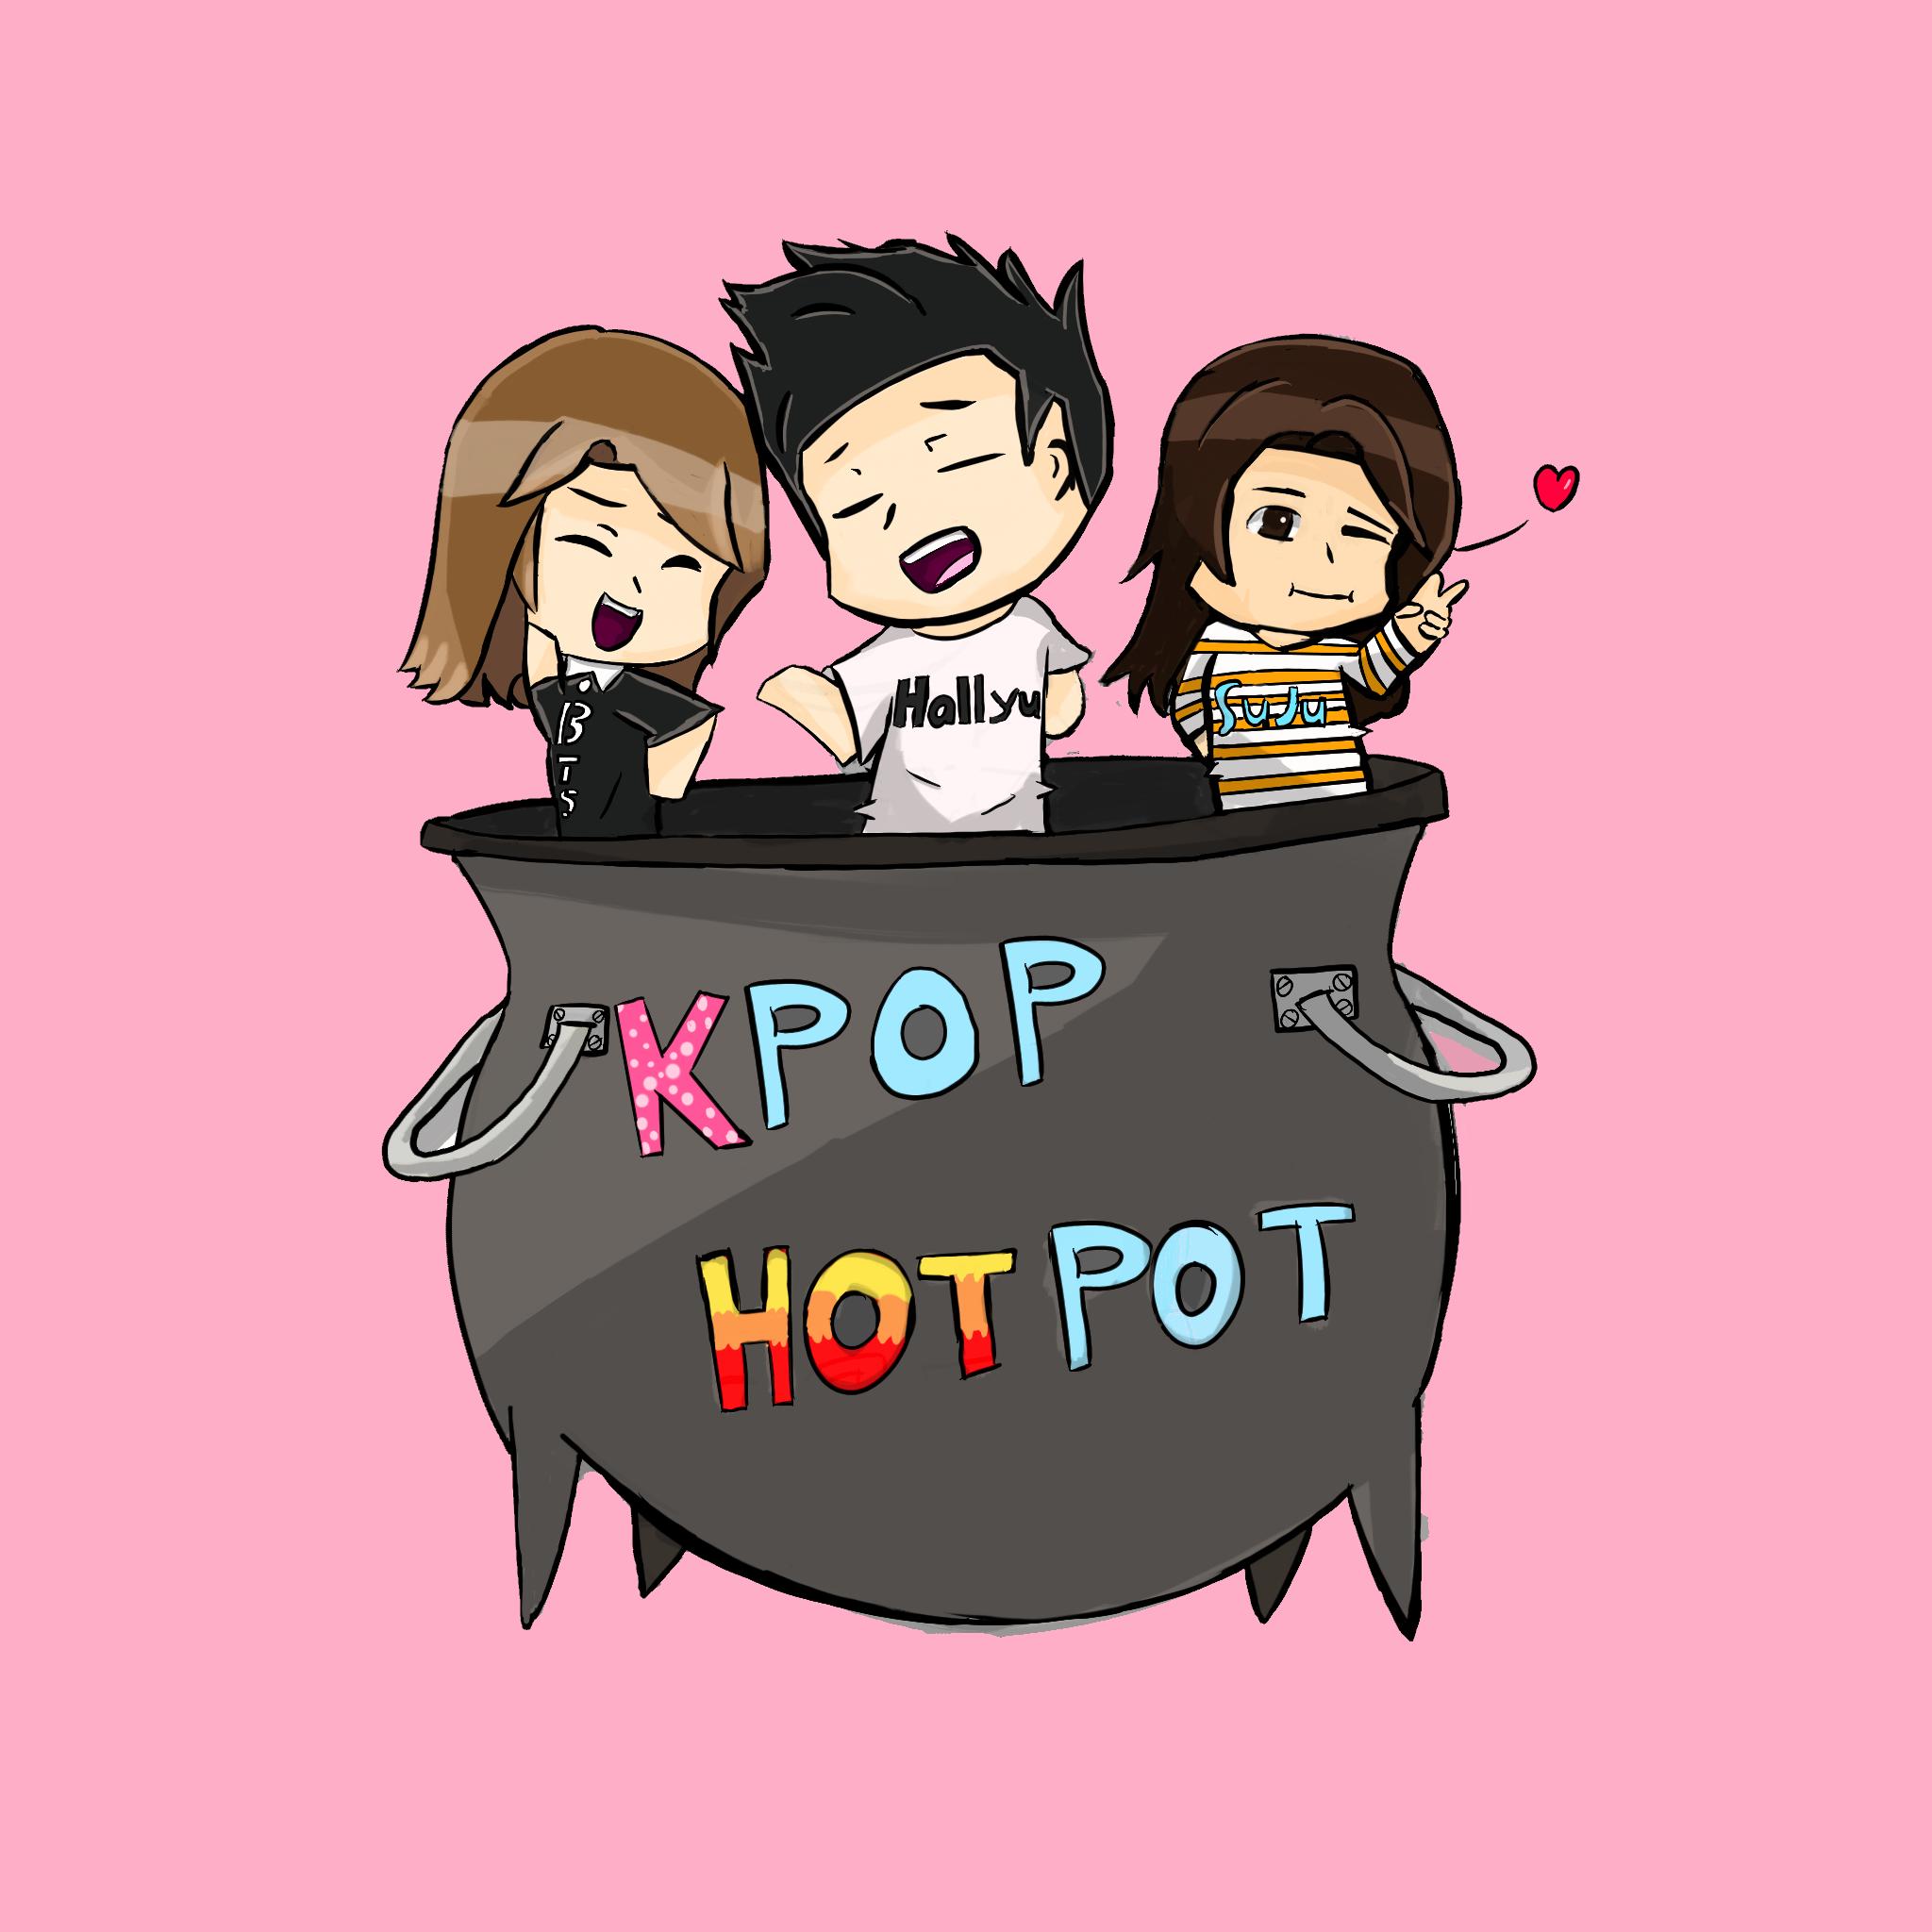 Kpop Hot Pot | Podbay